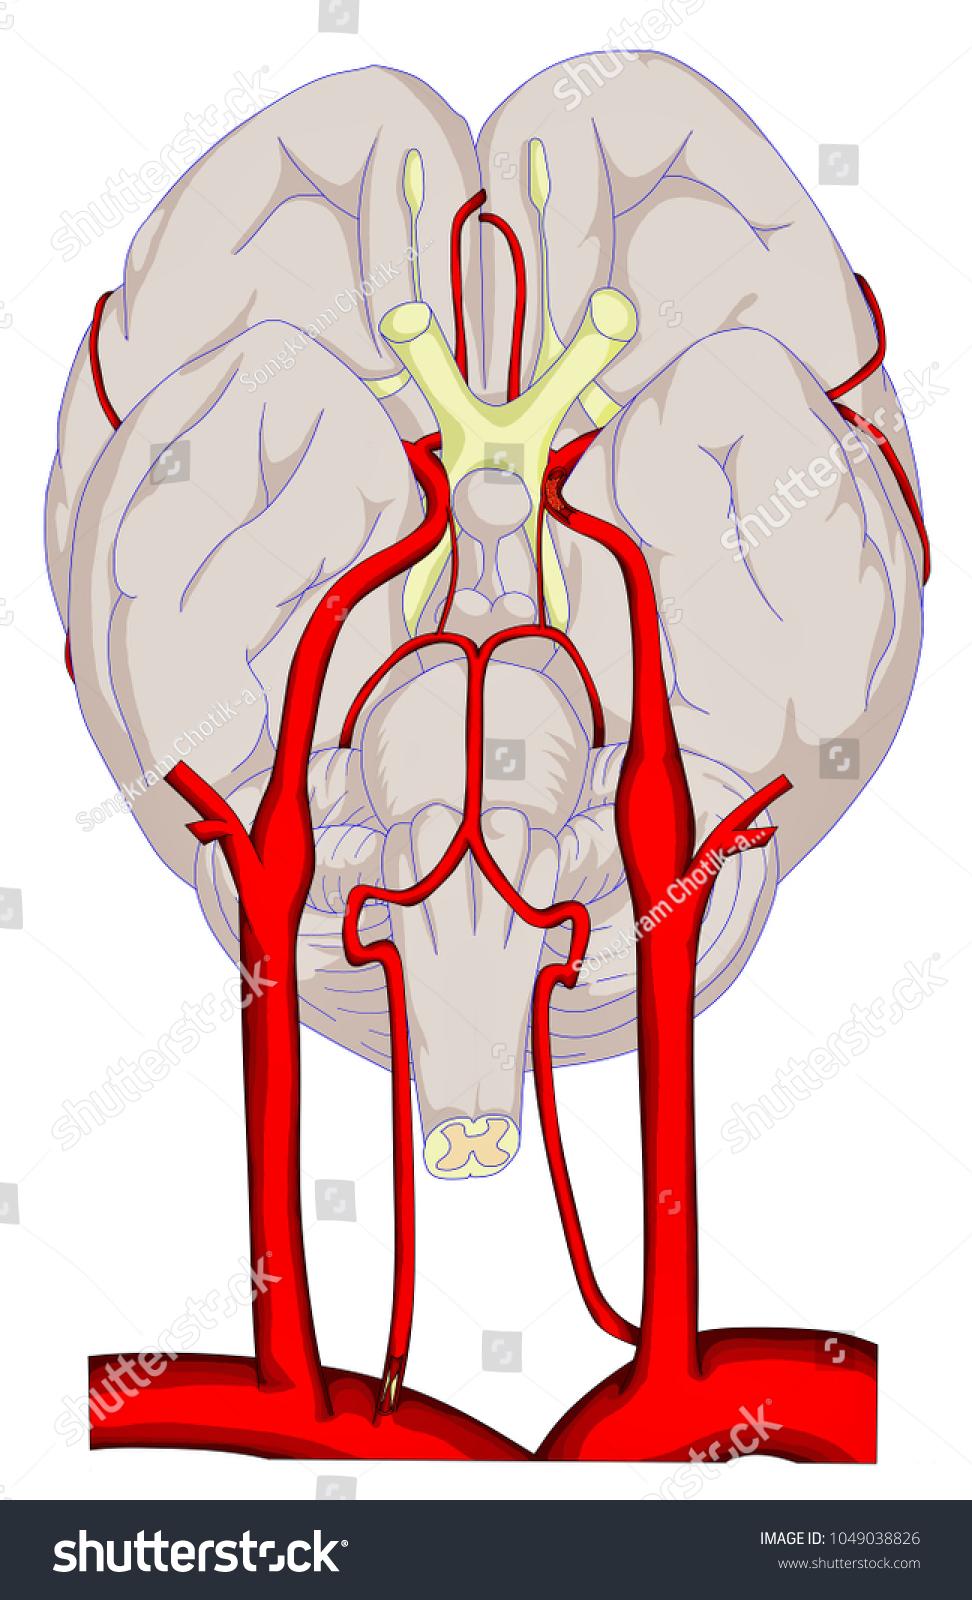 Intracranial Left Internal Carotid Occlusion Severe Stock